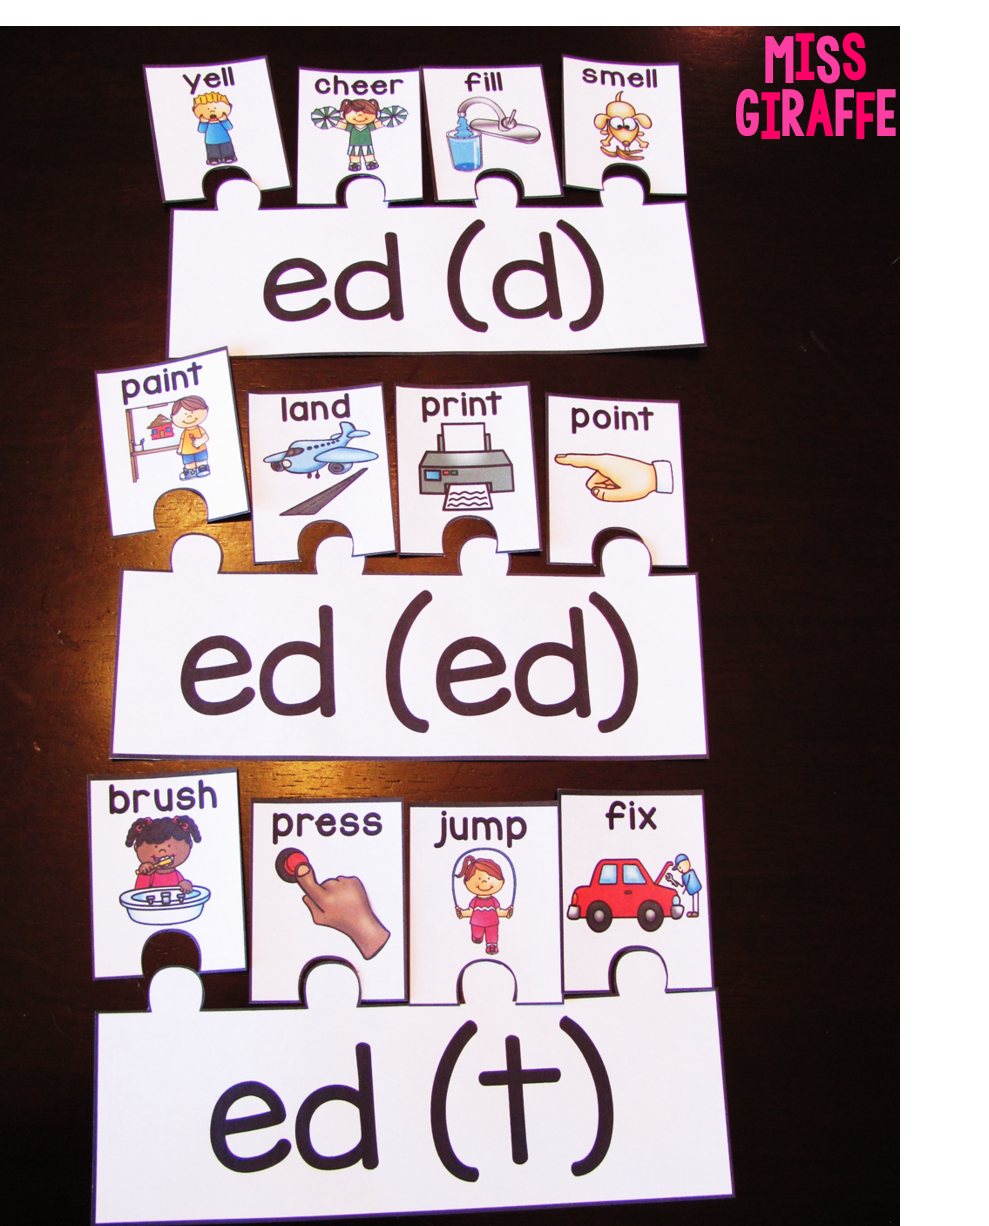 Prefixes And Suffixes Teaching Ideas For First Grade And Kindergarten Prefixes And Suffixes Miss Giraffe Teaching [ 1226 x 989 Pixel ]